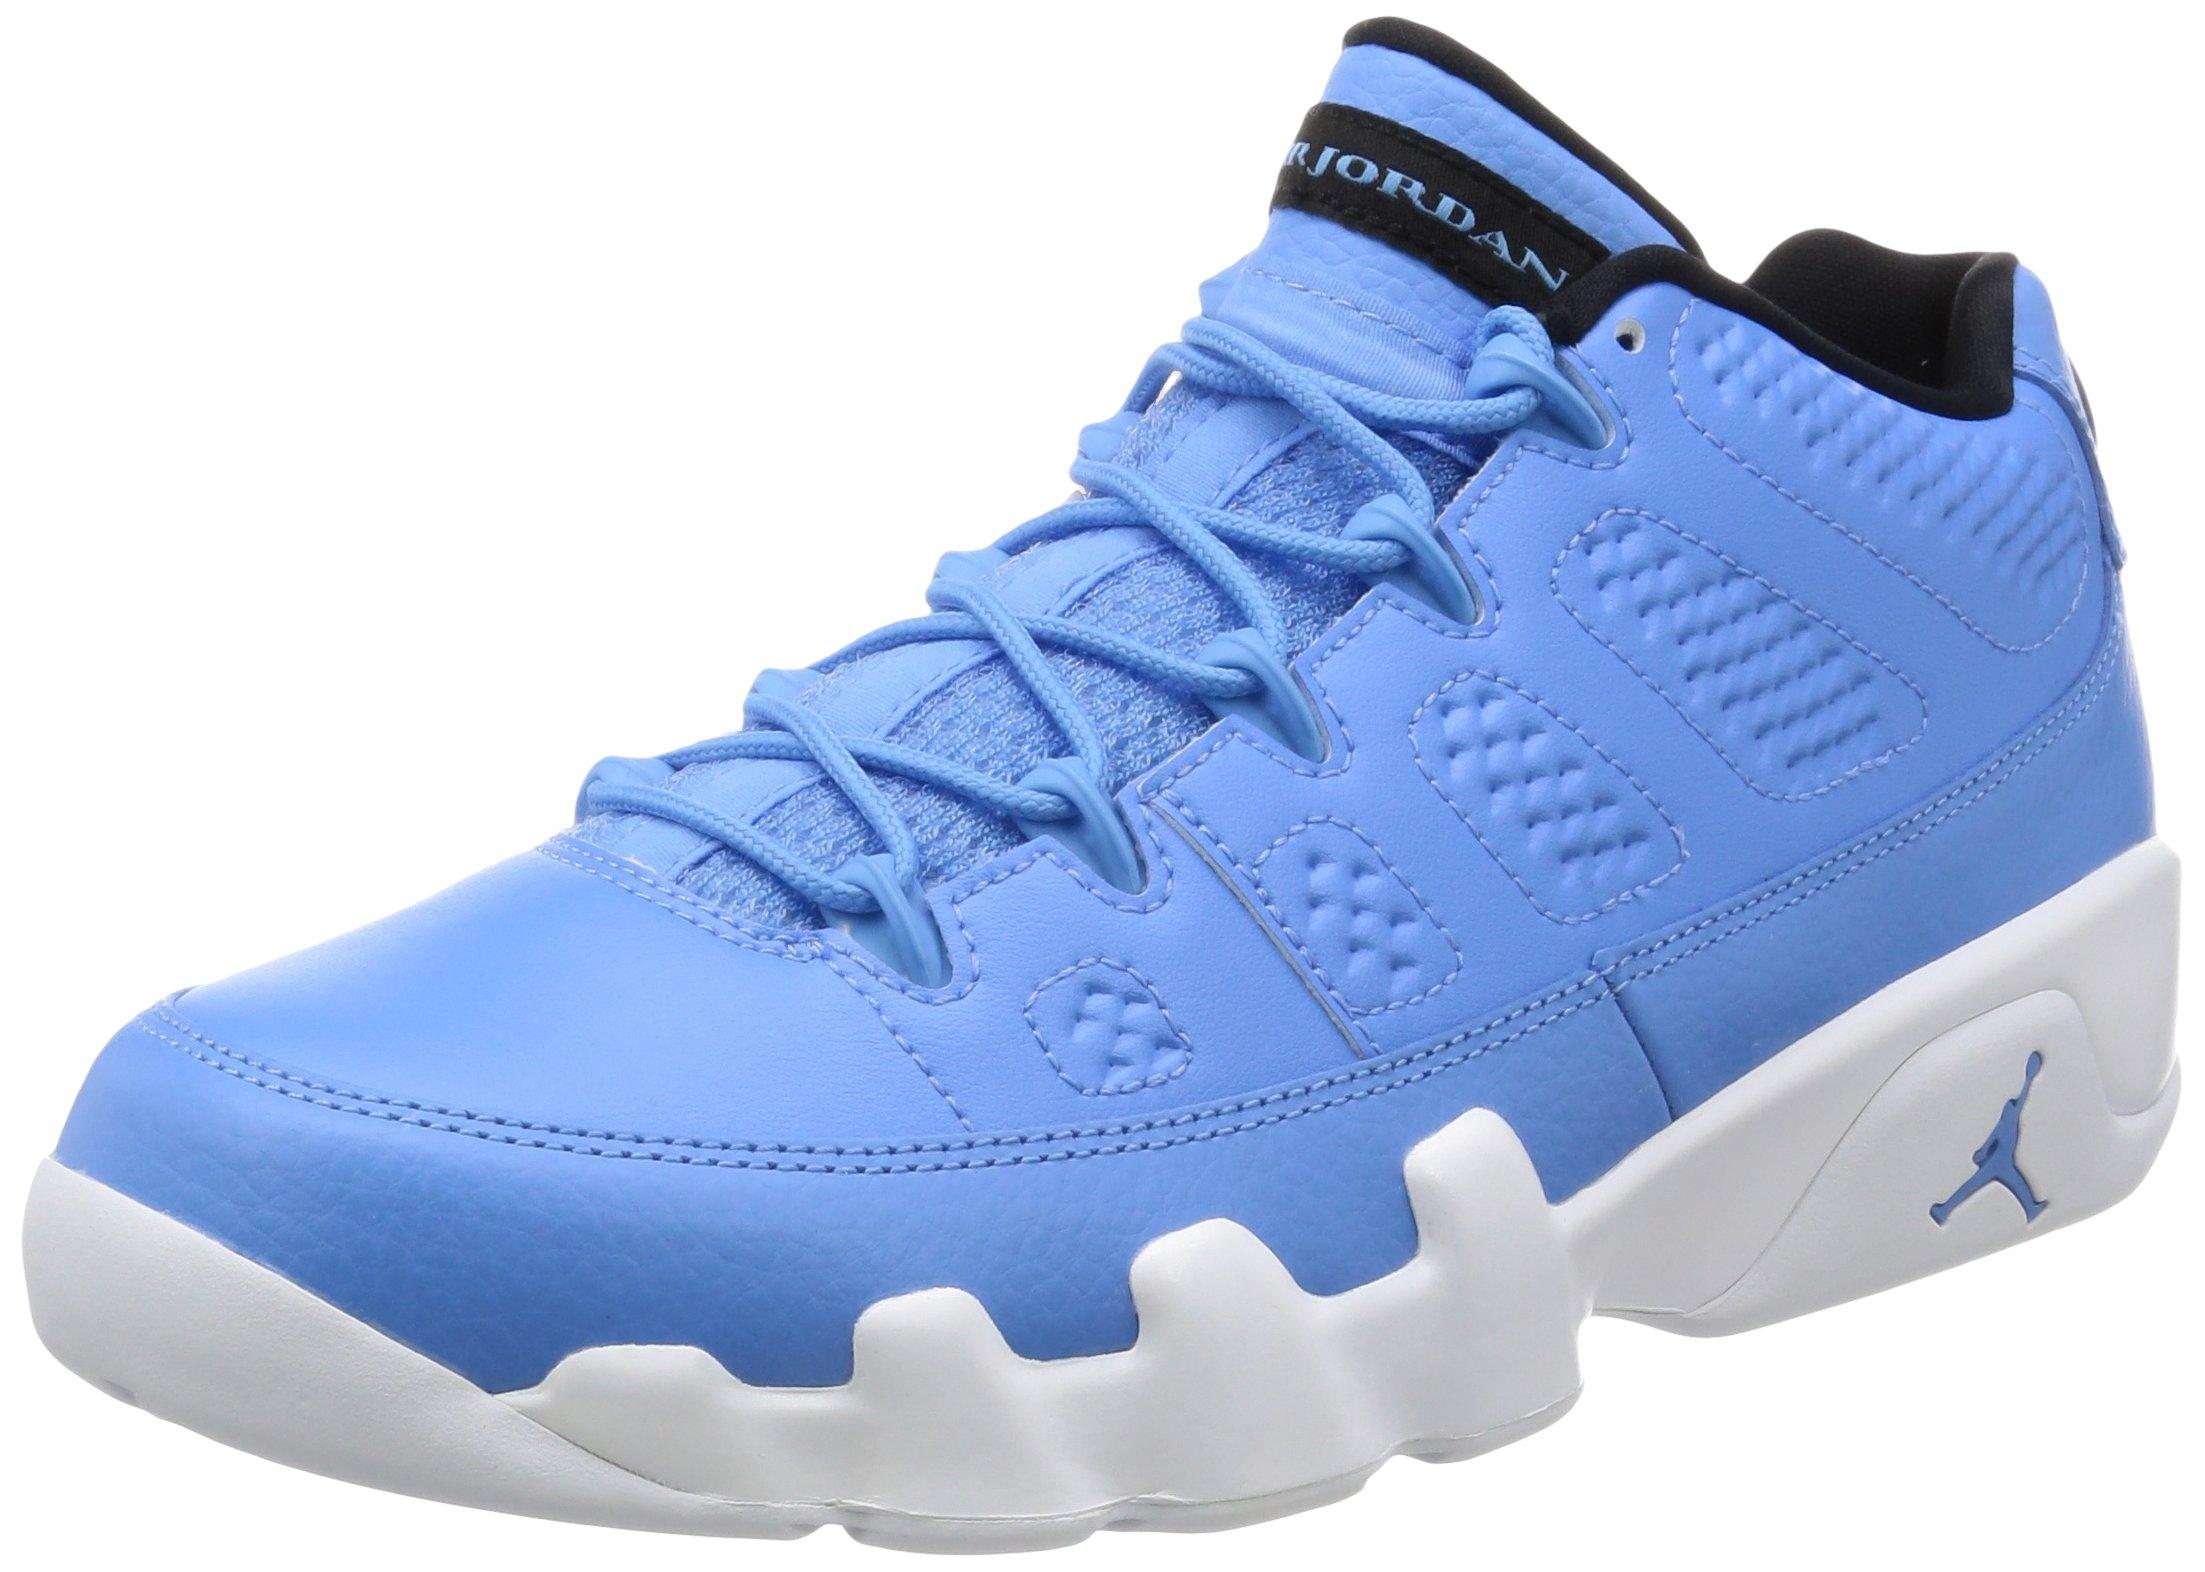 Jordan 9 Retro Low Mens Style: 832822-401 Size: 8 M US